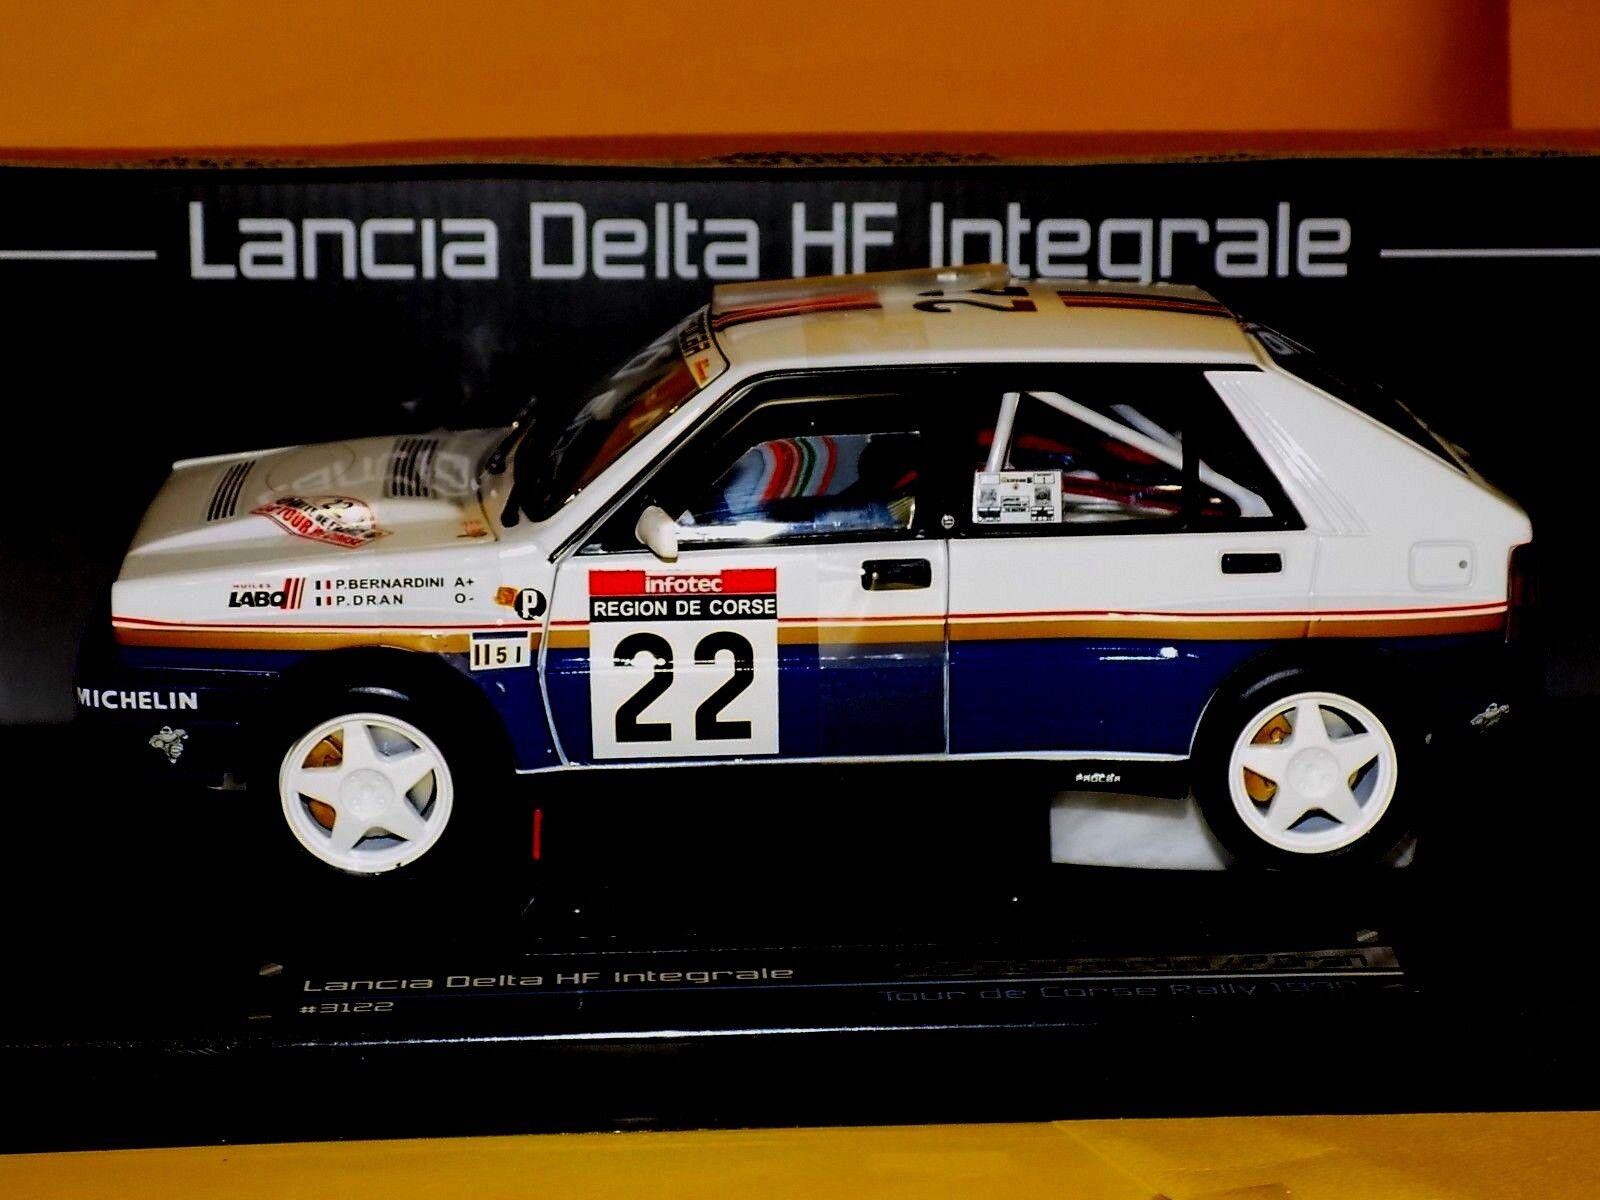 Lancia Delta HF Integrale  Bernardini Tour De Corse 1990 SUN STAR 3122 1 18